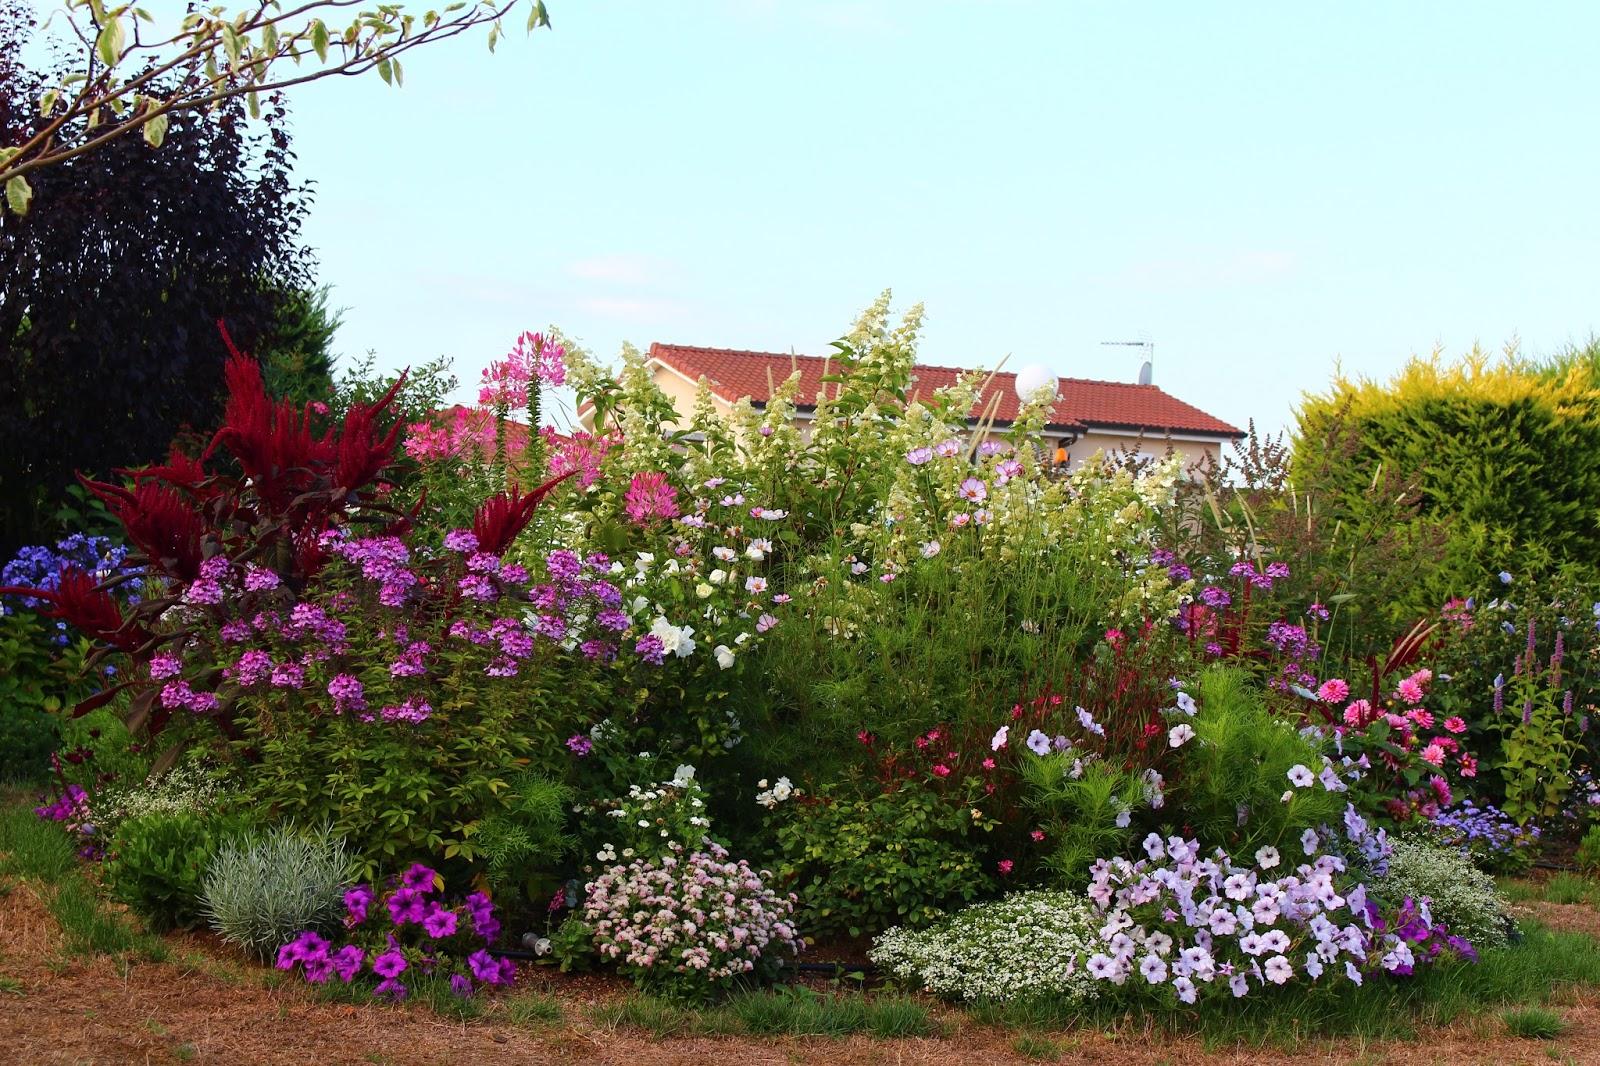 roses du jardin ch neland fleurs de l 39 t 2015. Black Bedroom Furniture Sets. Home Design Ideas